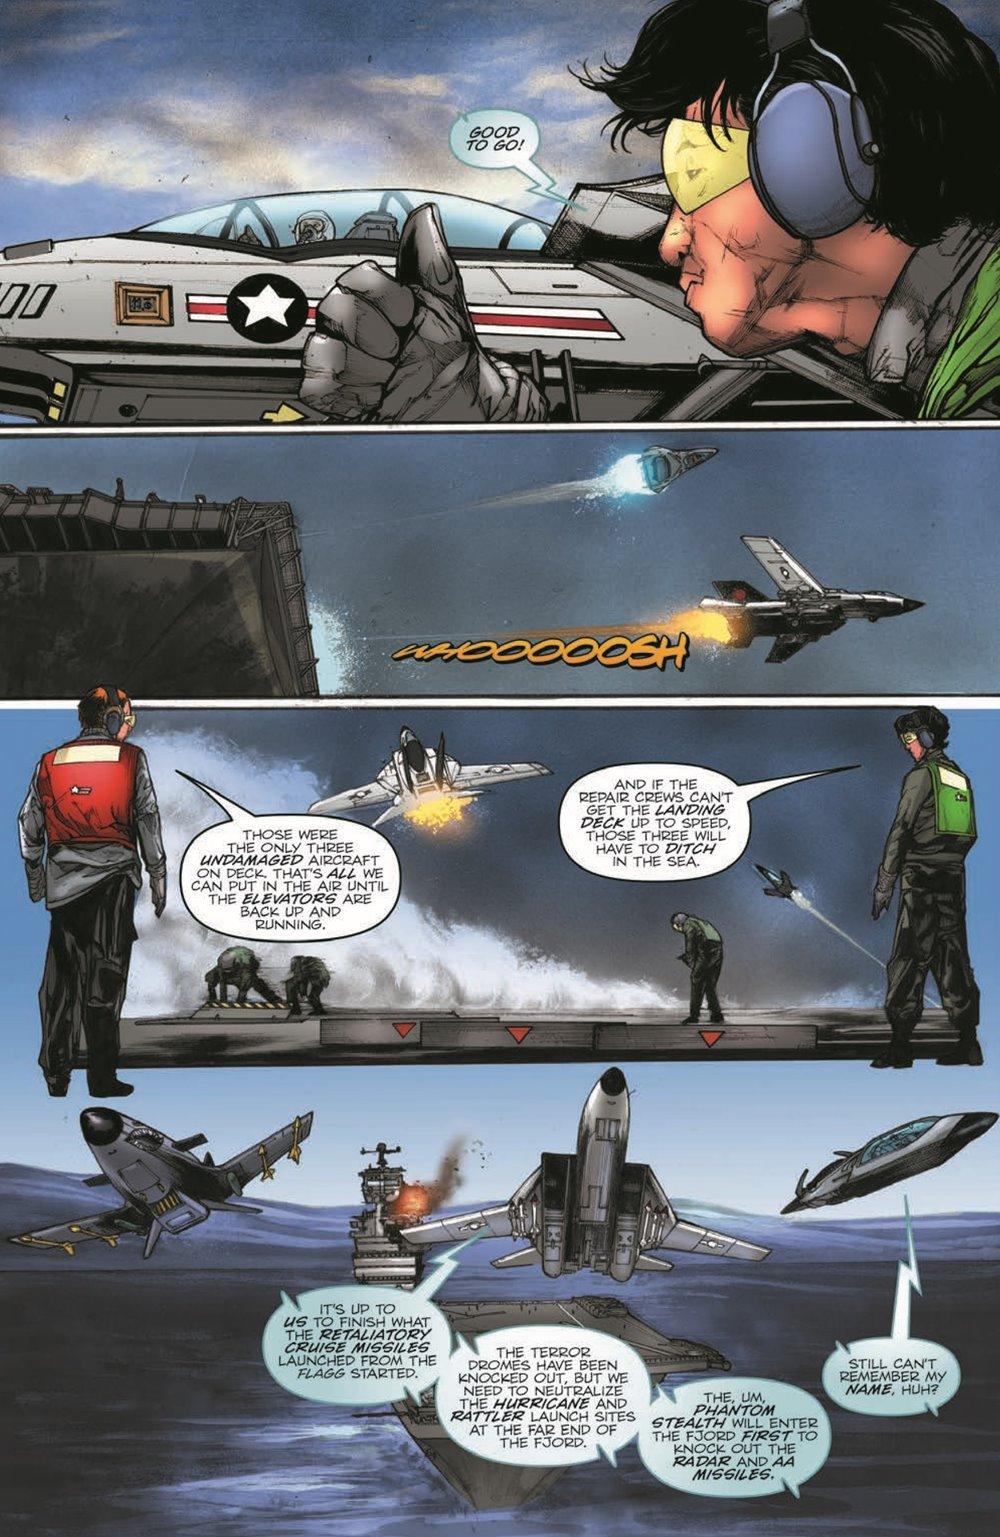 GIJoeRAH279-pr-5 ComicList Previews: G.I. JOE A REAL AMERICAN HERO #279